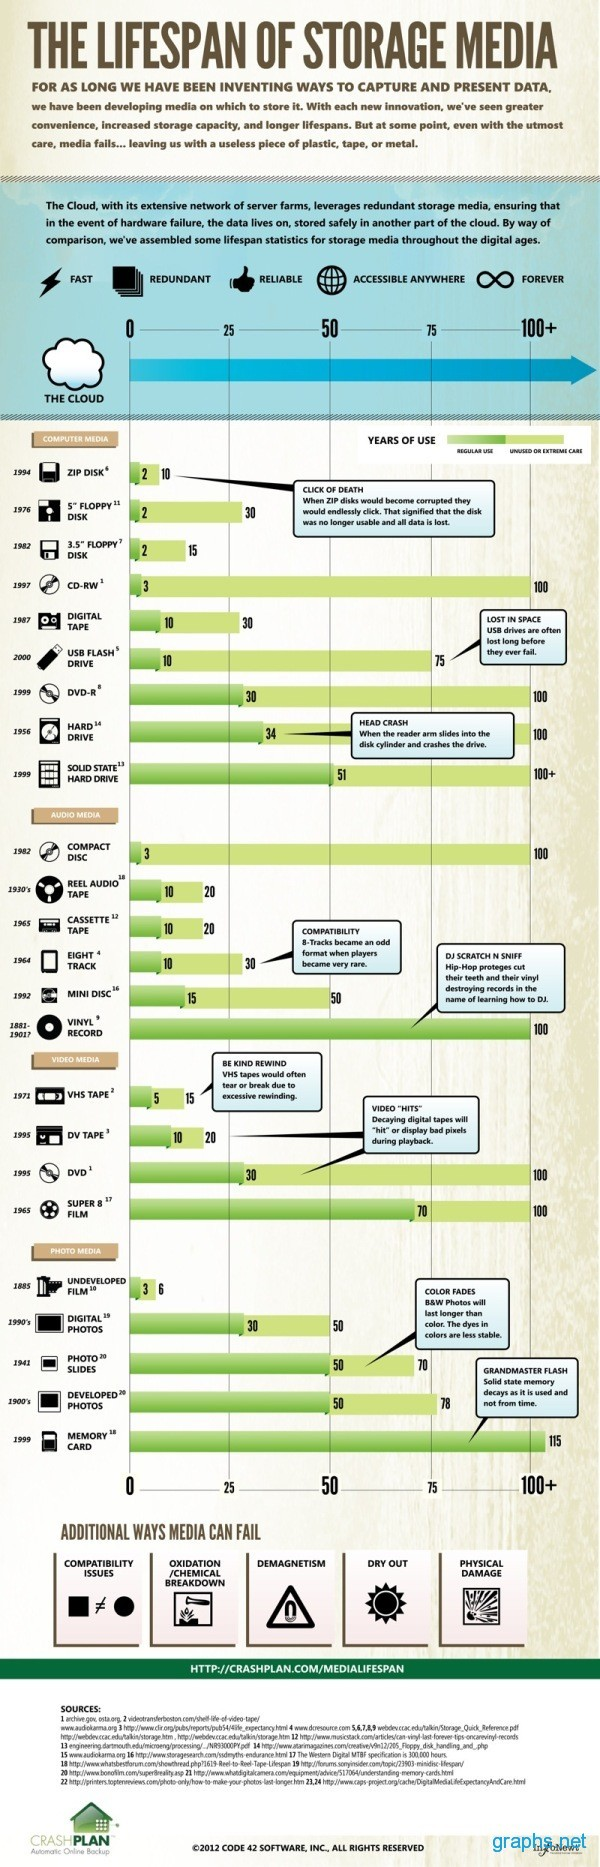 Storage Media Lifespan